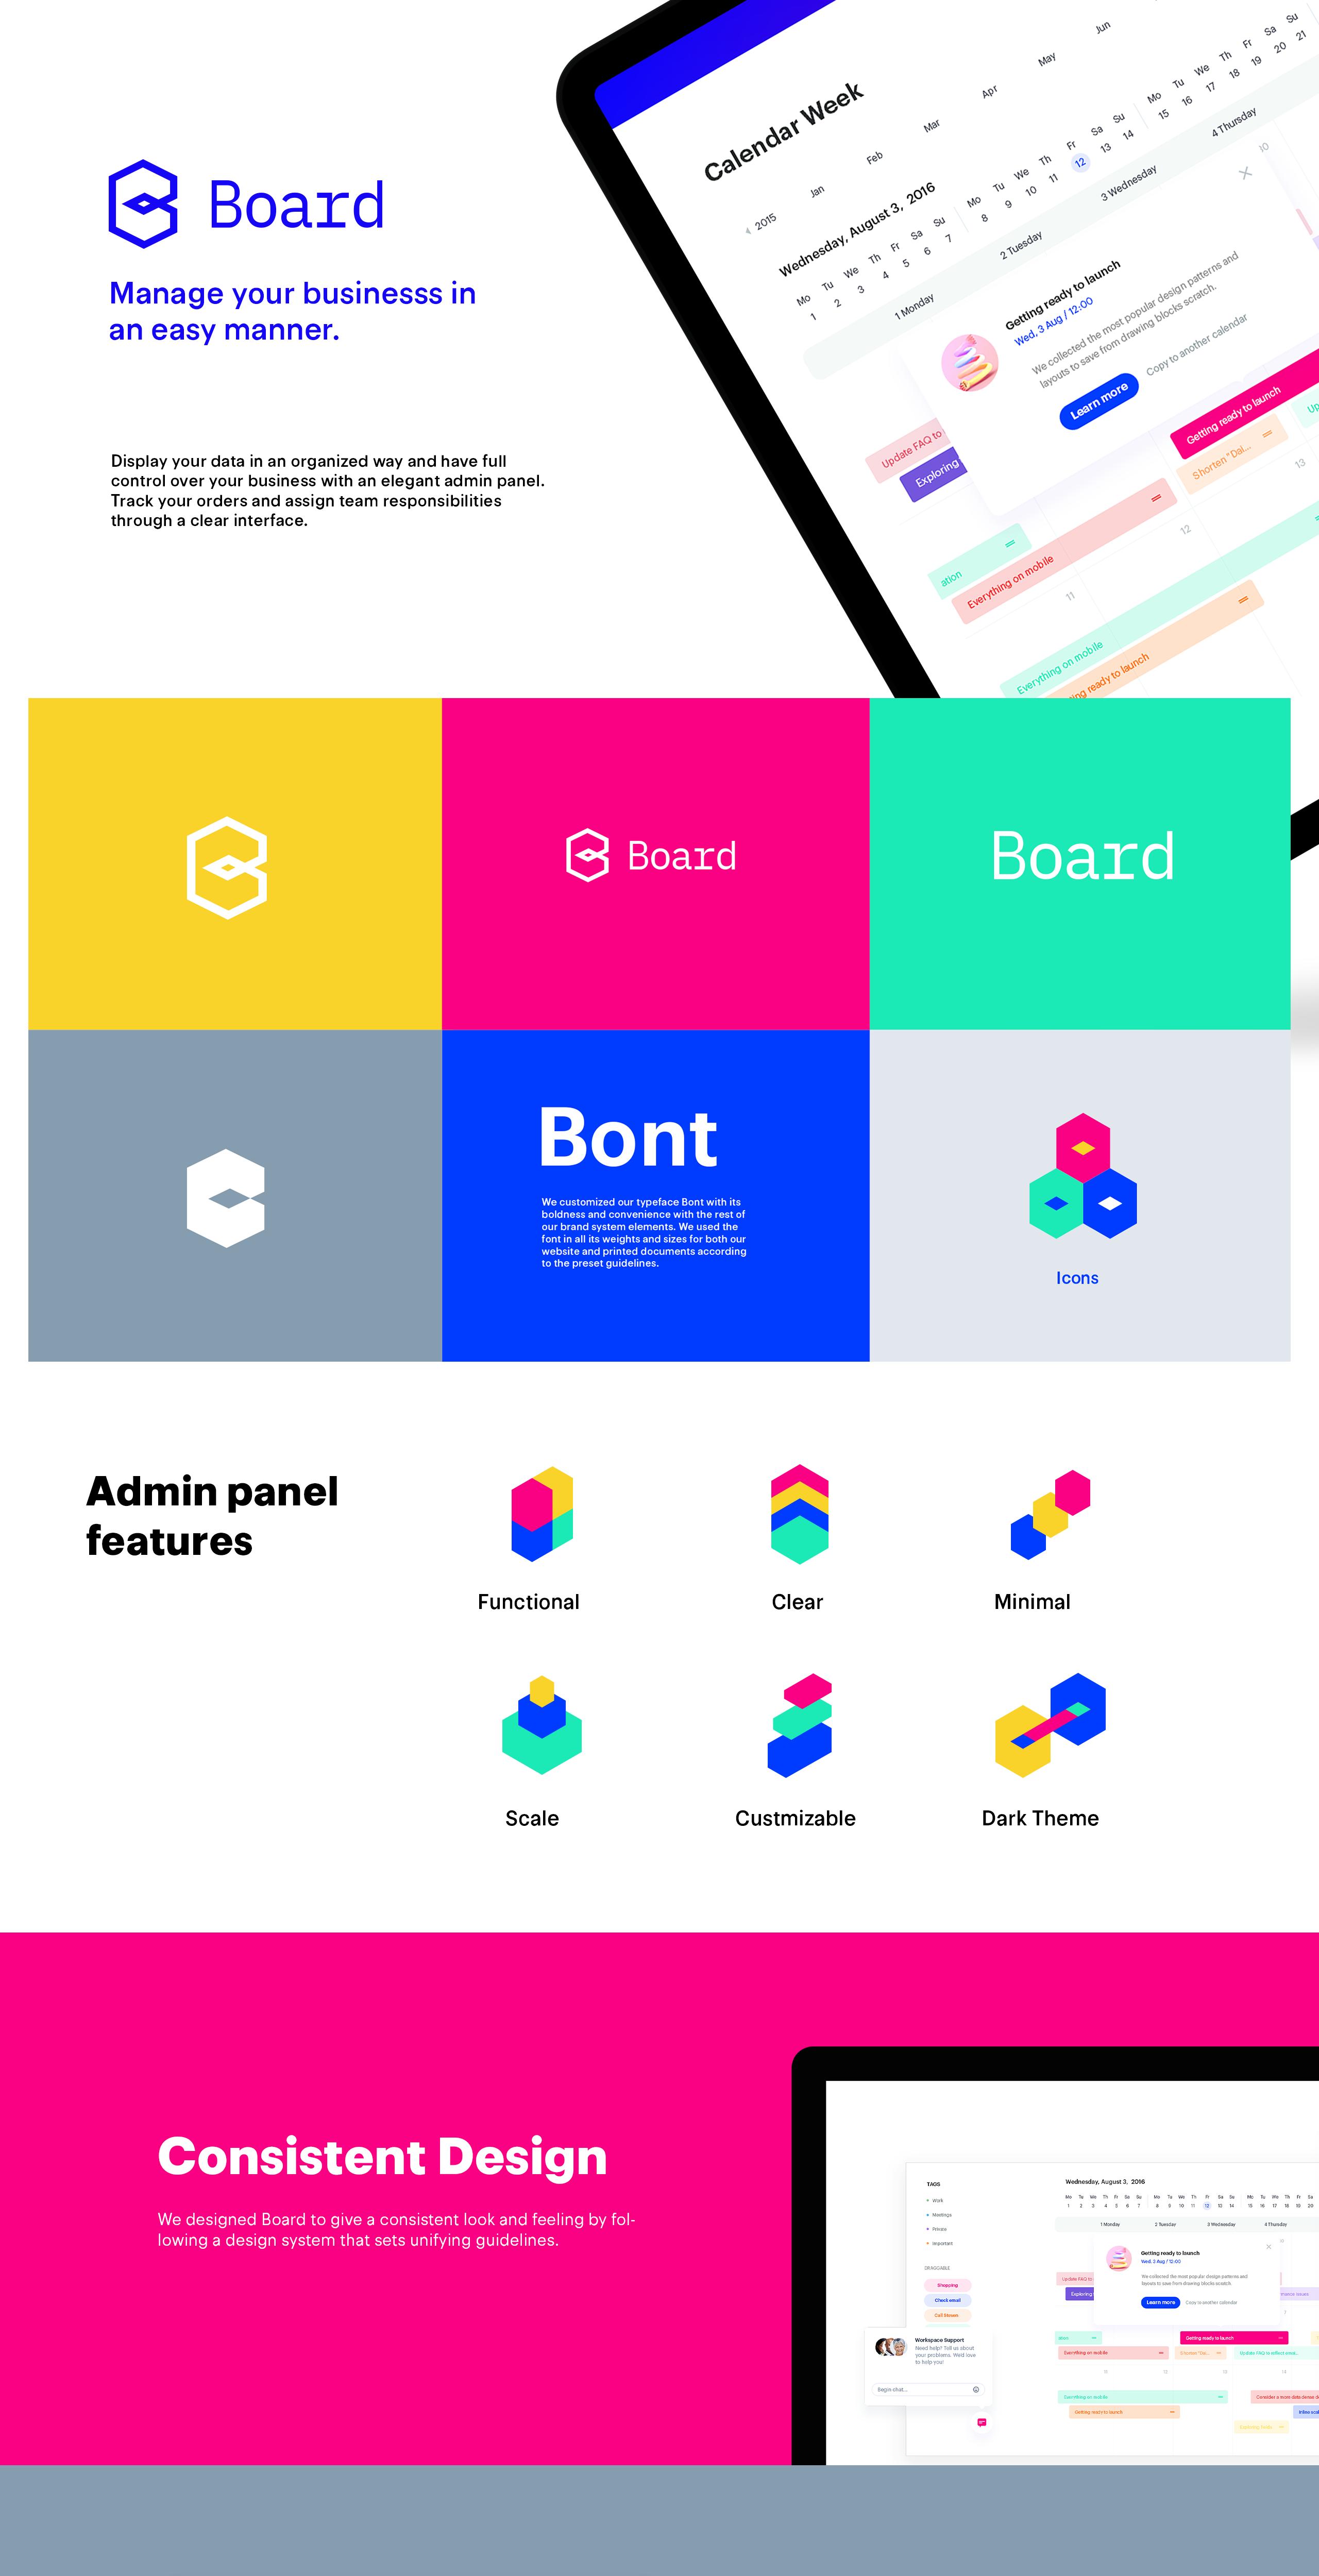 Board admin panel